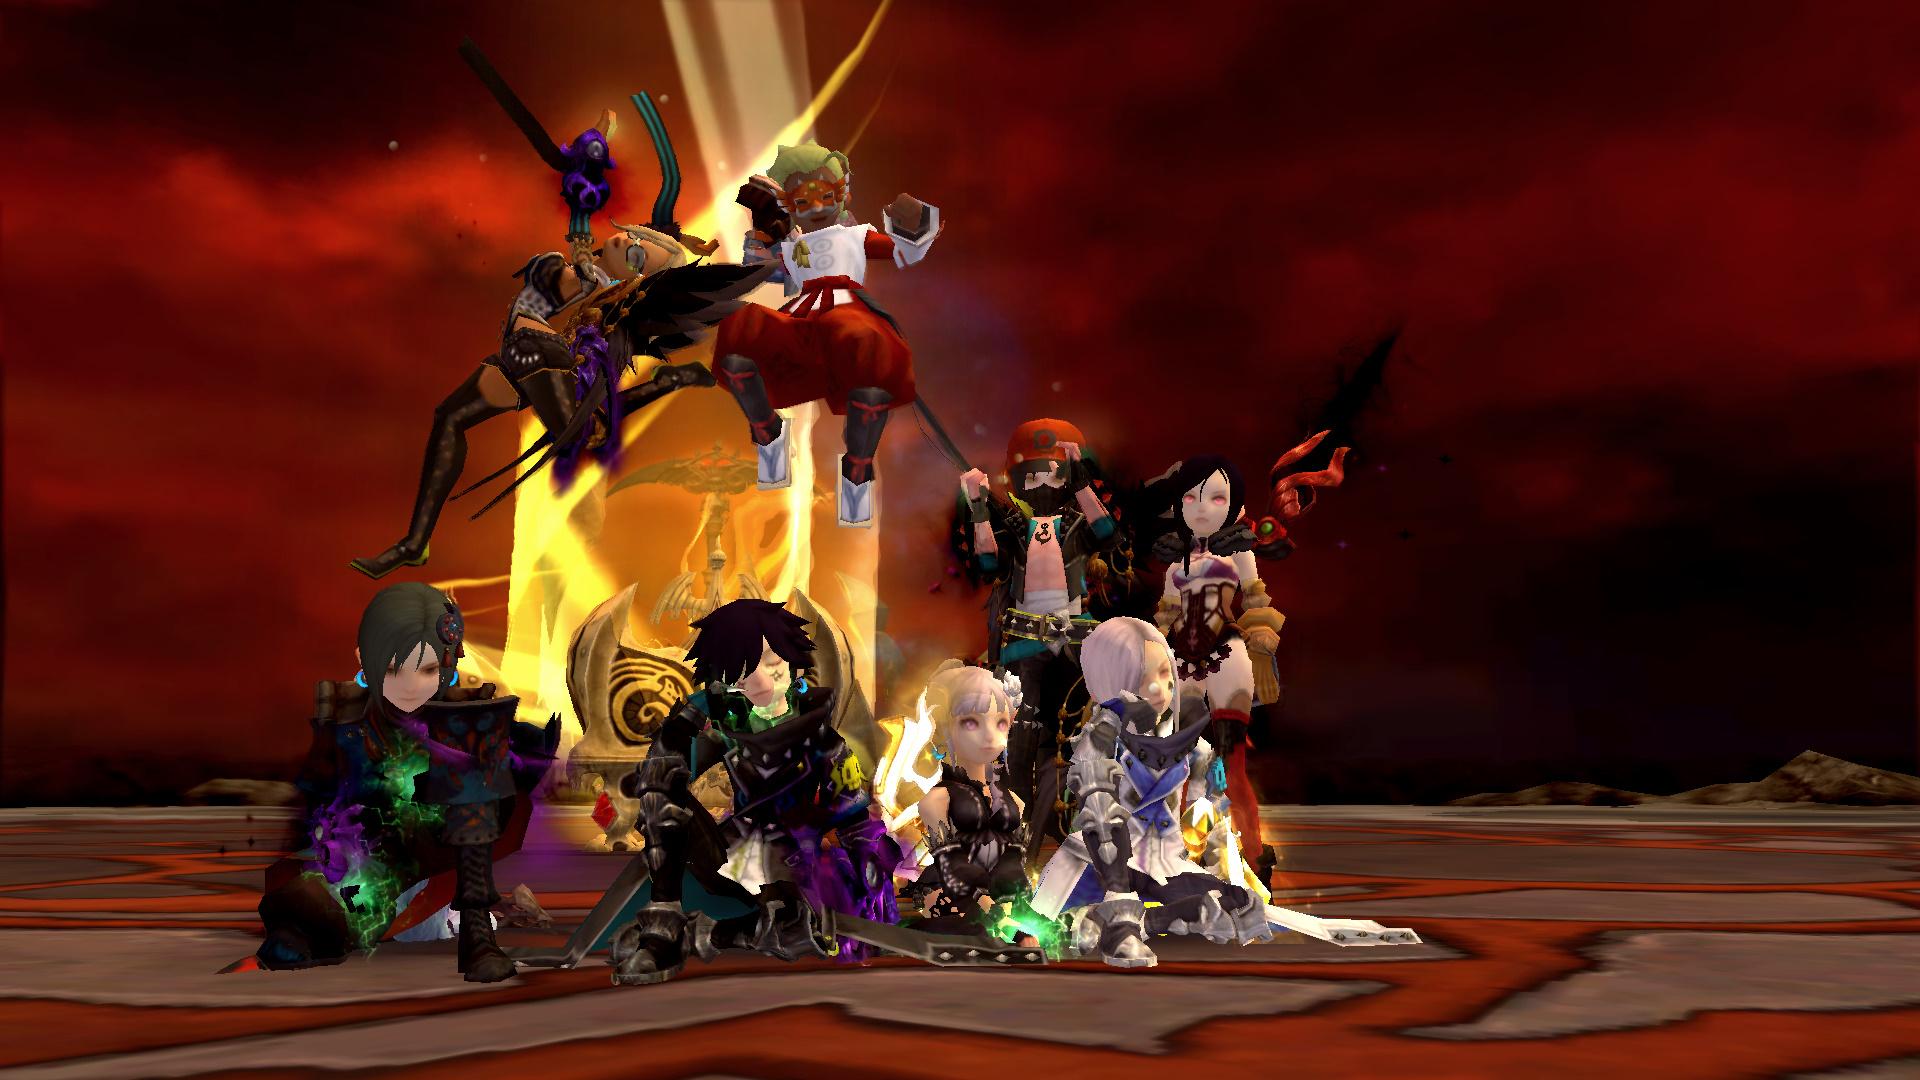 dragonnest 2014-02-18 22-38-25-968